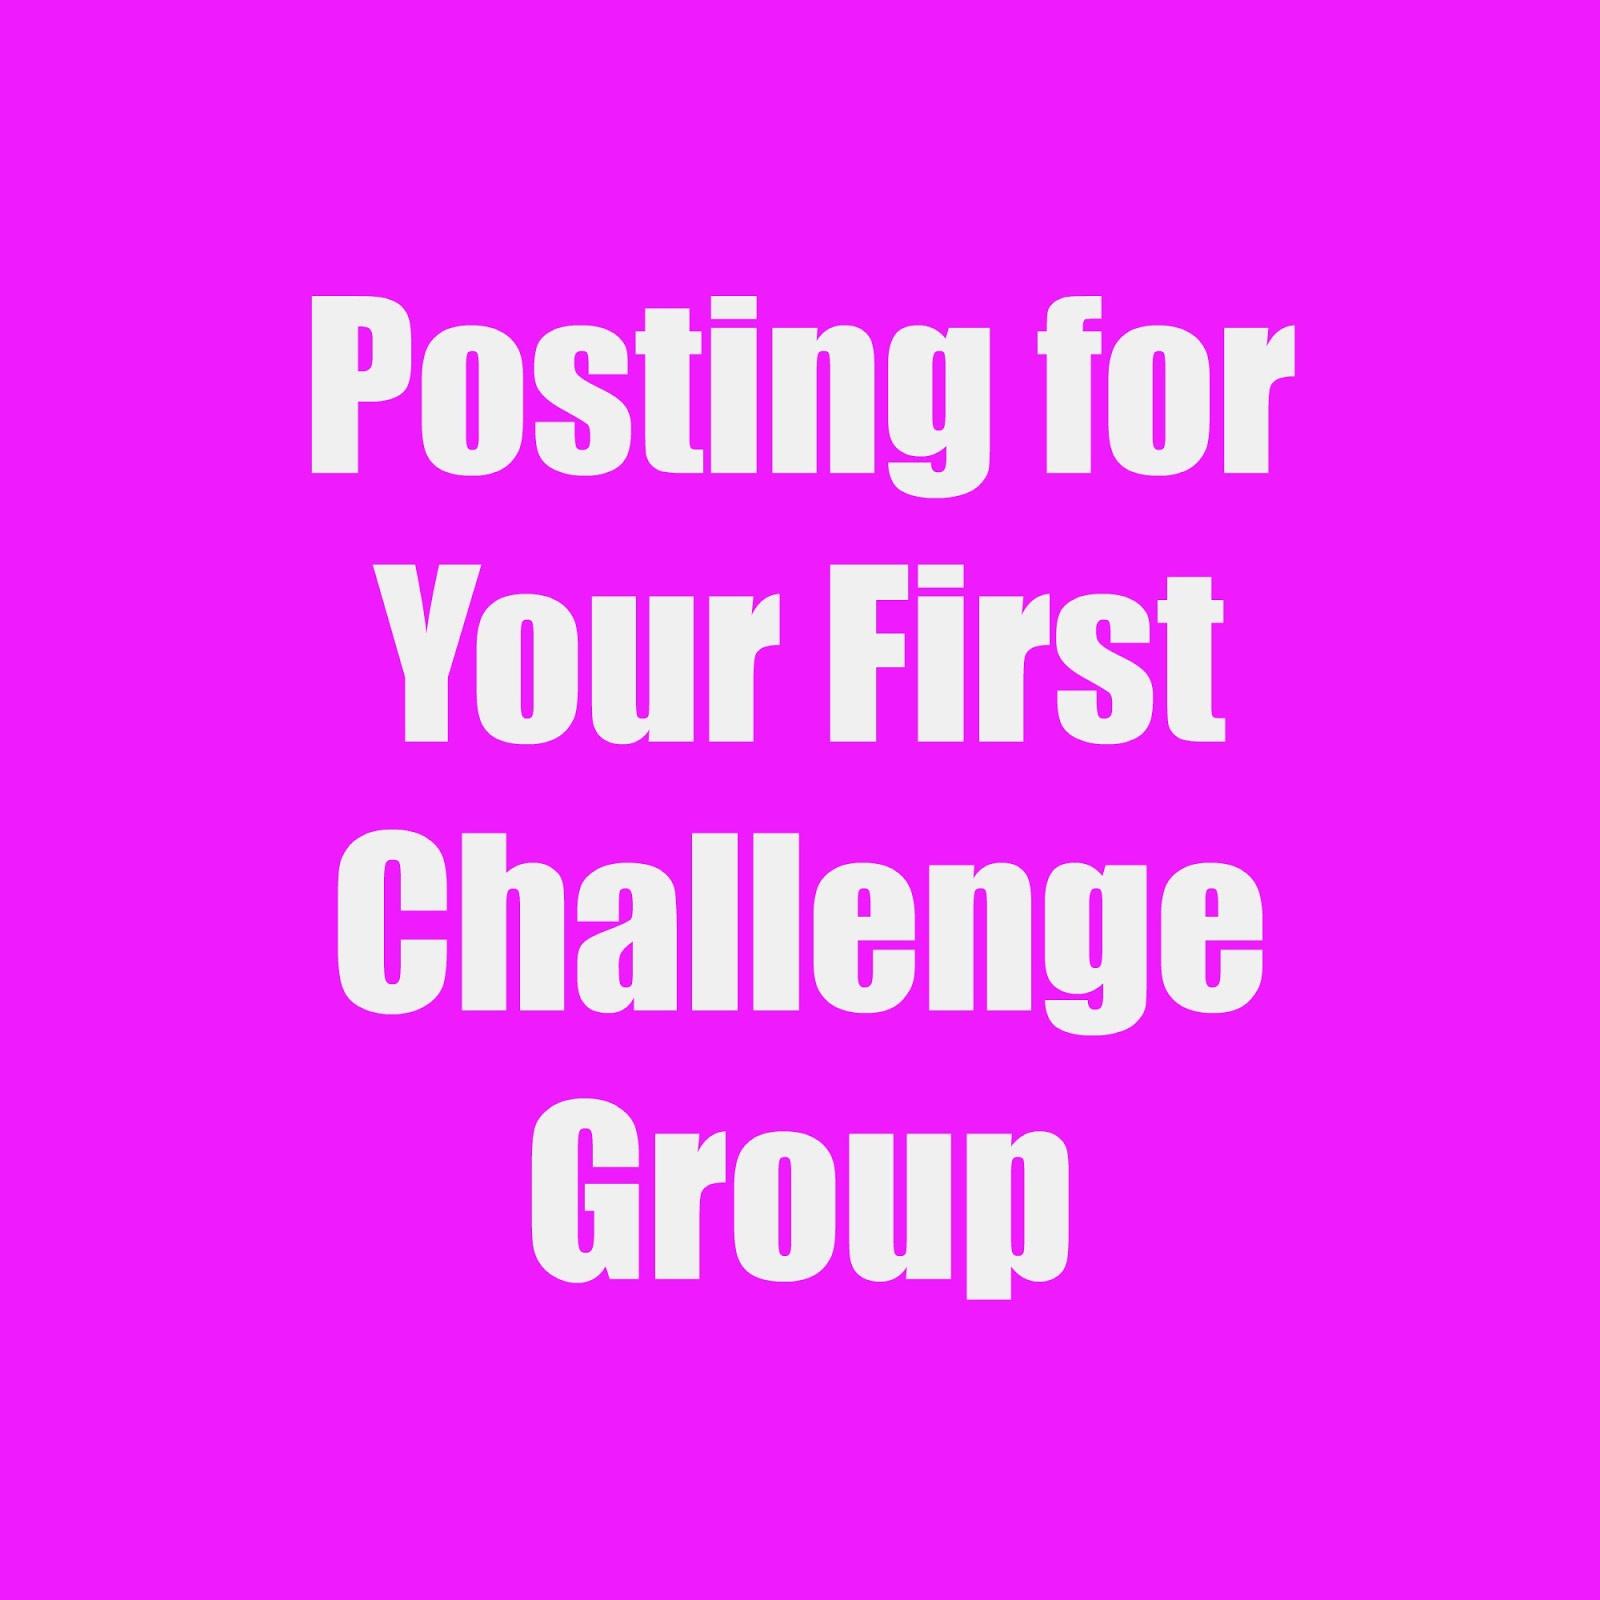 90 challenge group post ideas   fit chix & fellas team resources